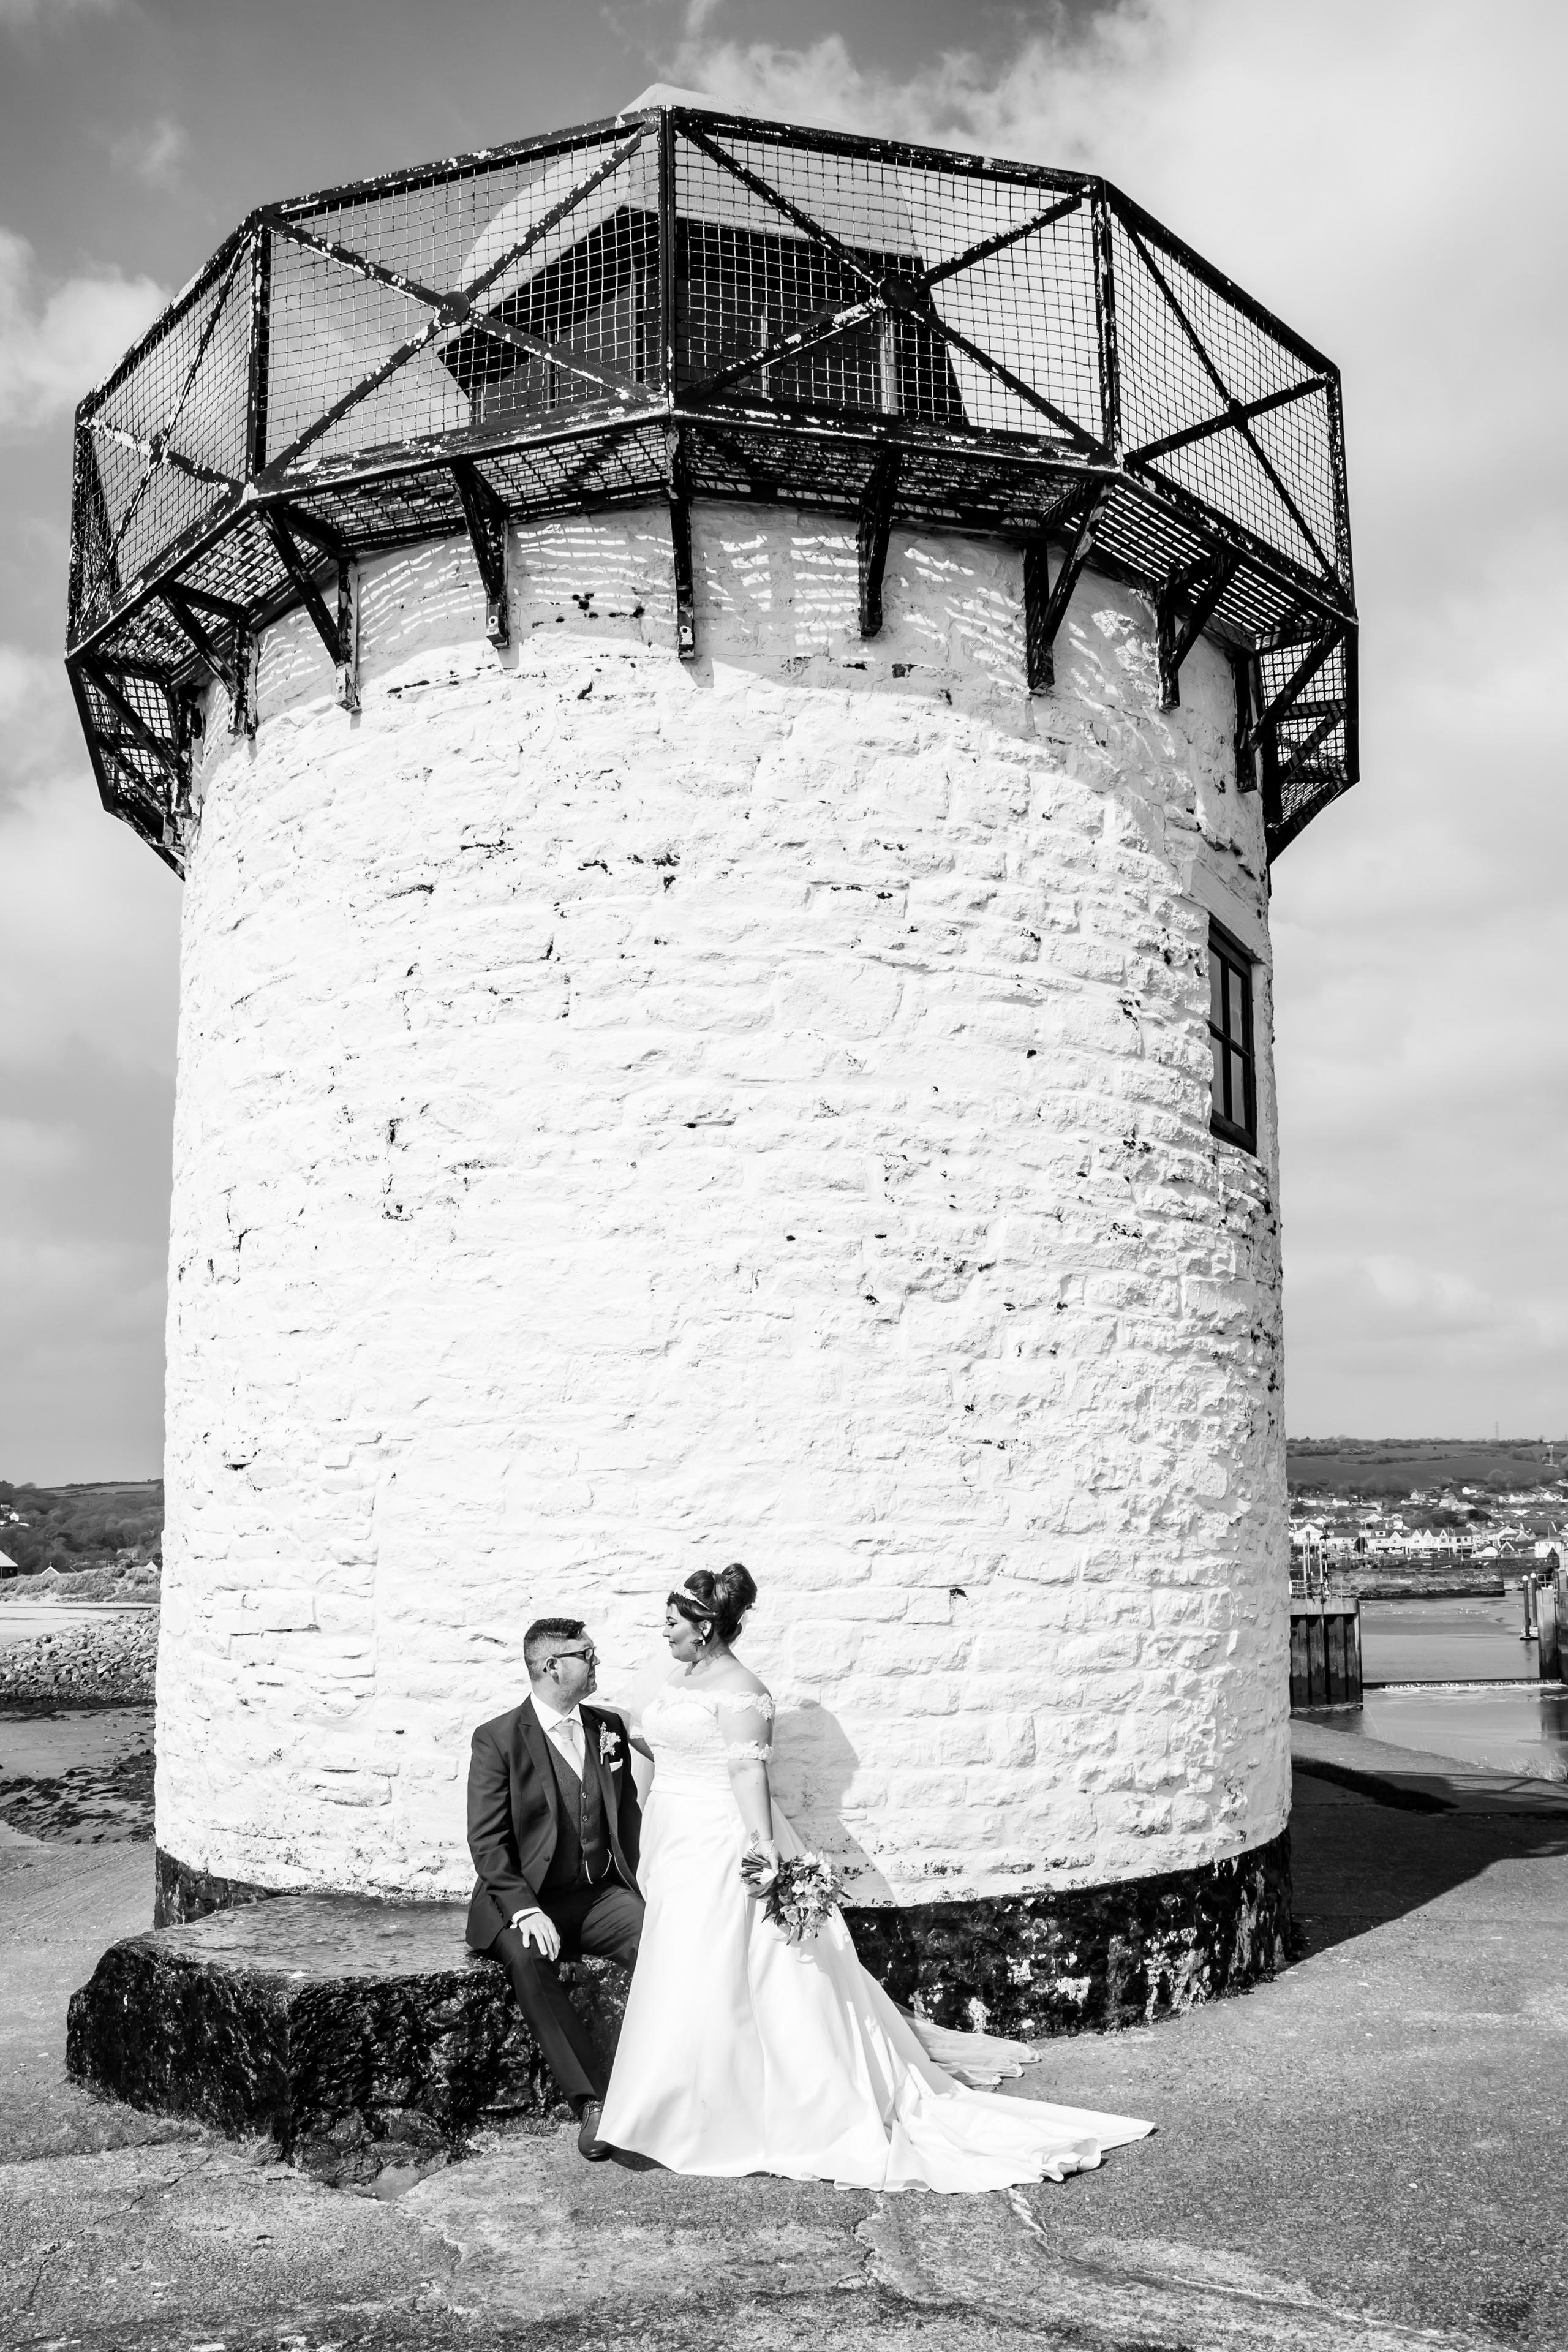 Burry Port Lighthouse Wedding Photography near the Gower and Swansea Beach